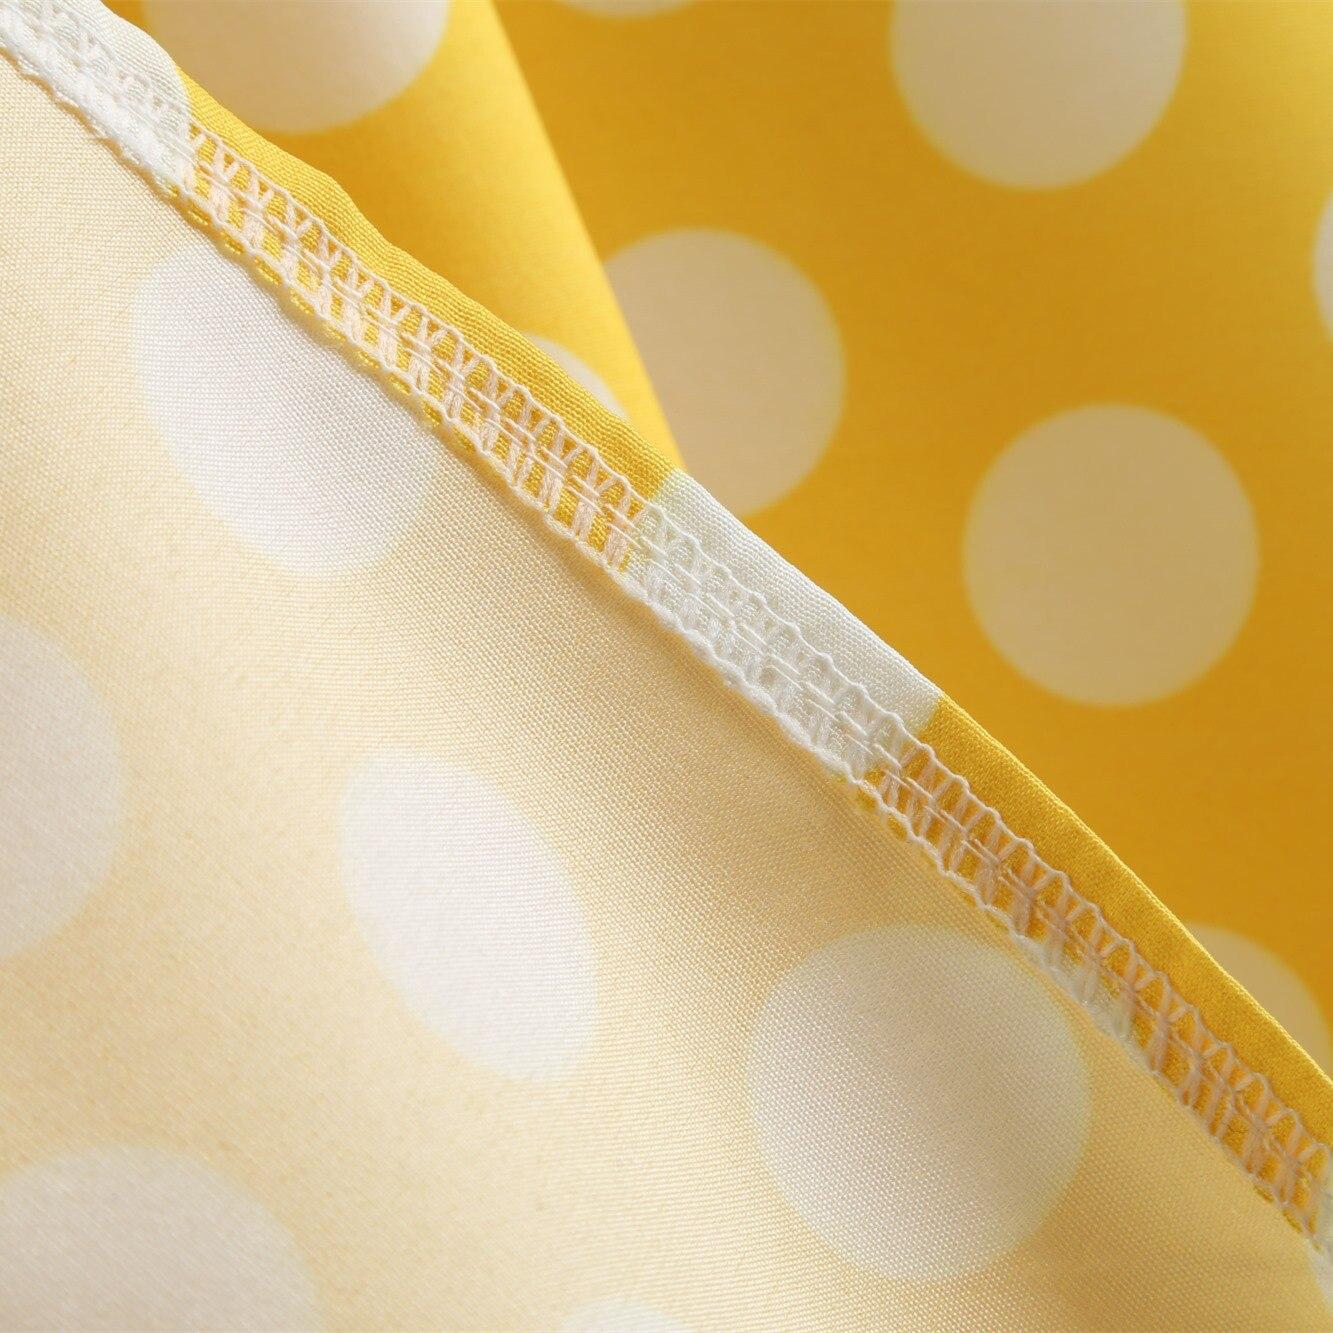 Bebovizi New 2018 Yellow Wave Point Women 39 s Dress Mesh Stitching Summer Sleeveless Party Elegant Audrey Hepburn Midi Dresses in Dresses from Women 39 s Clothing